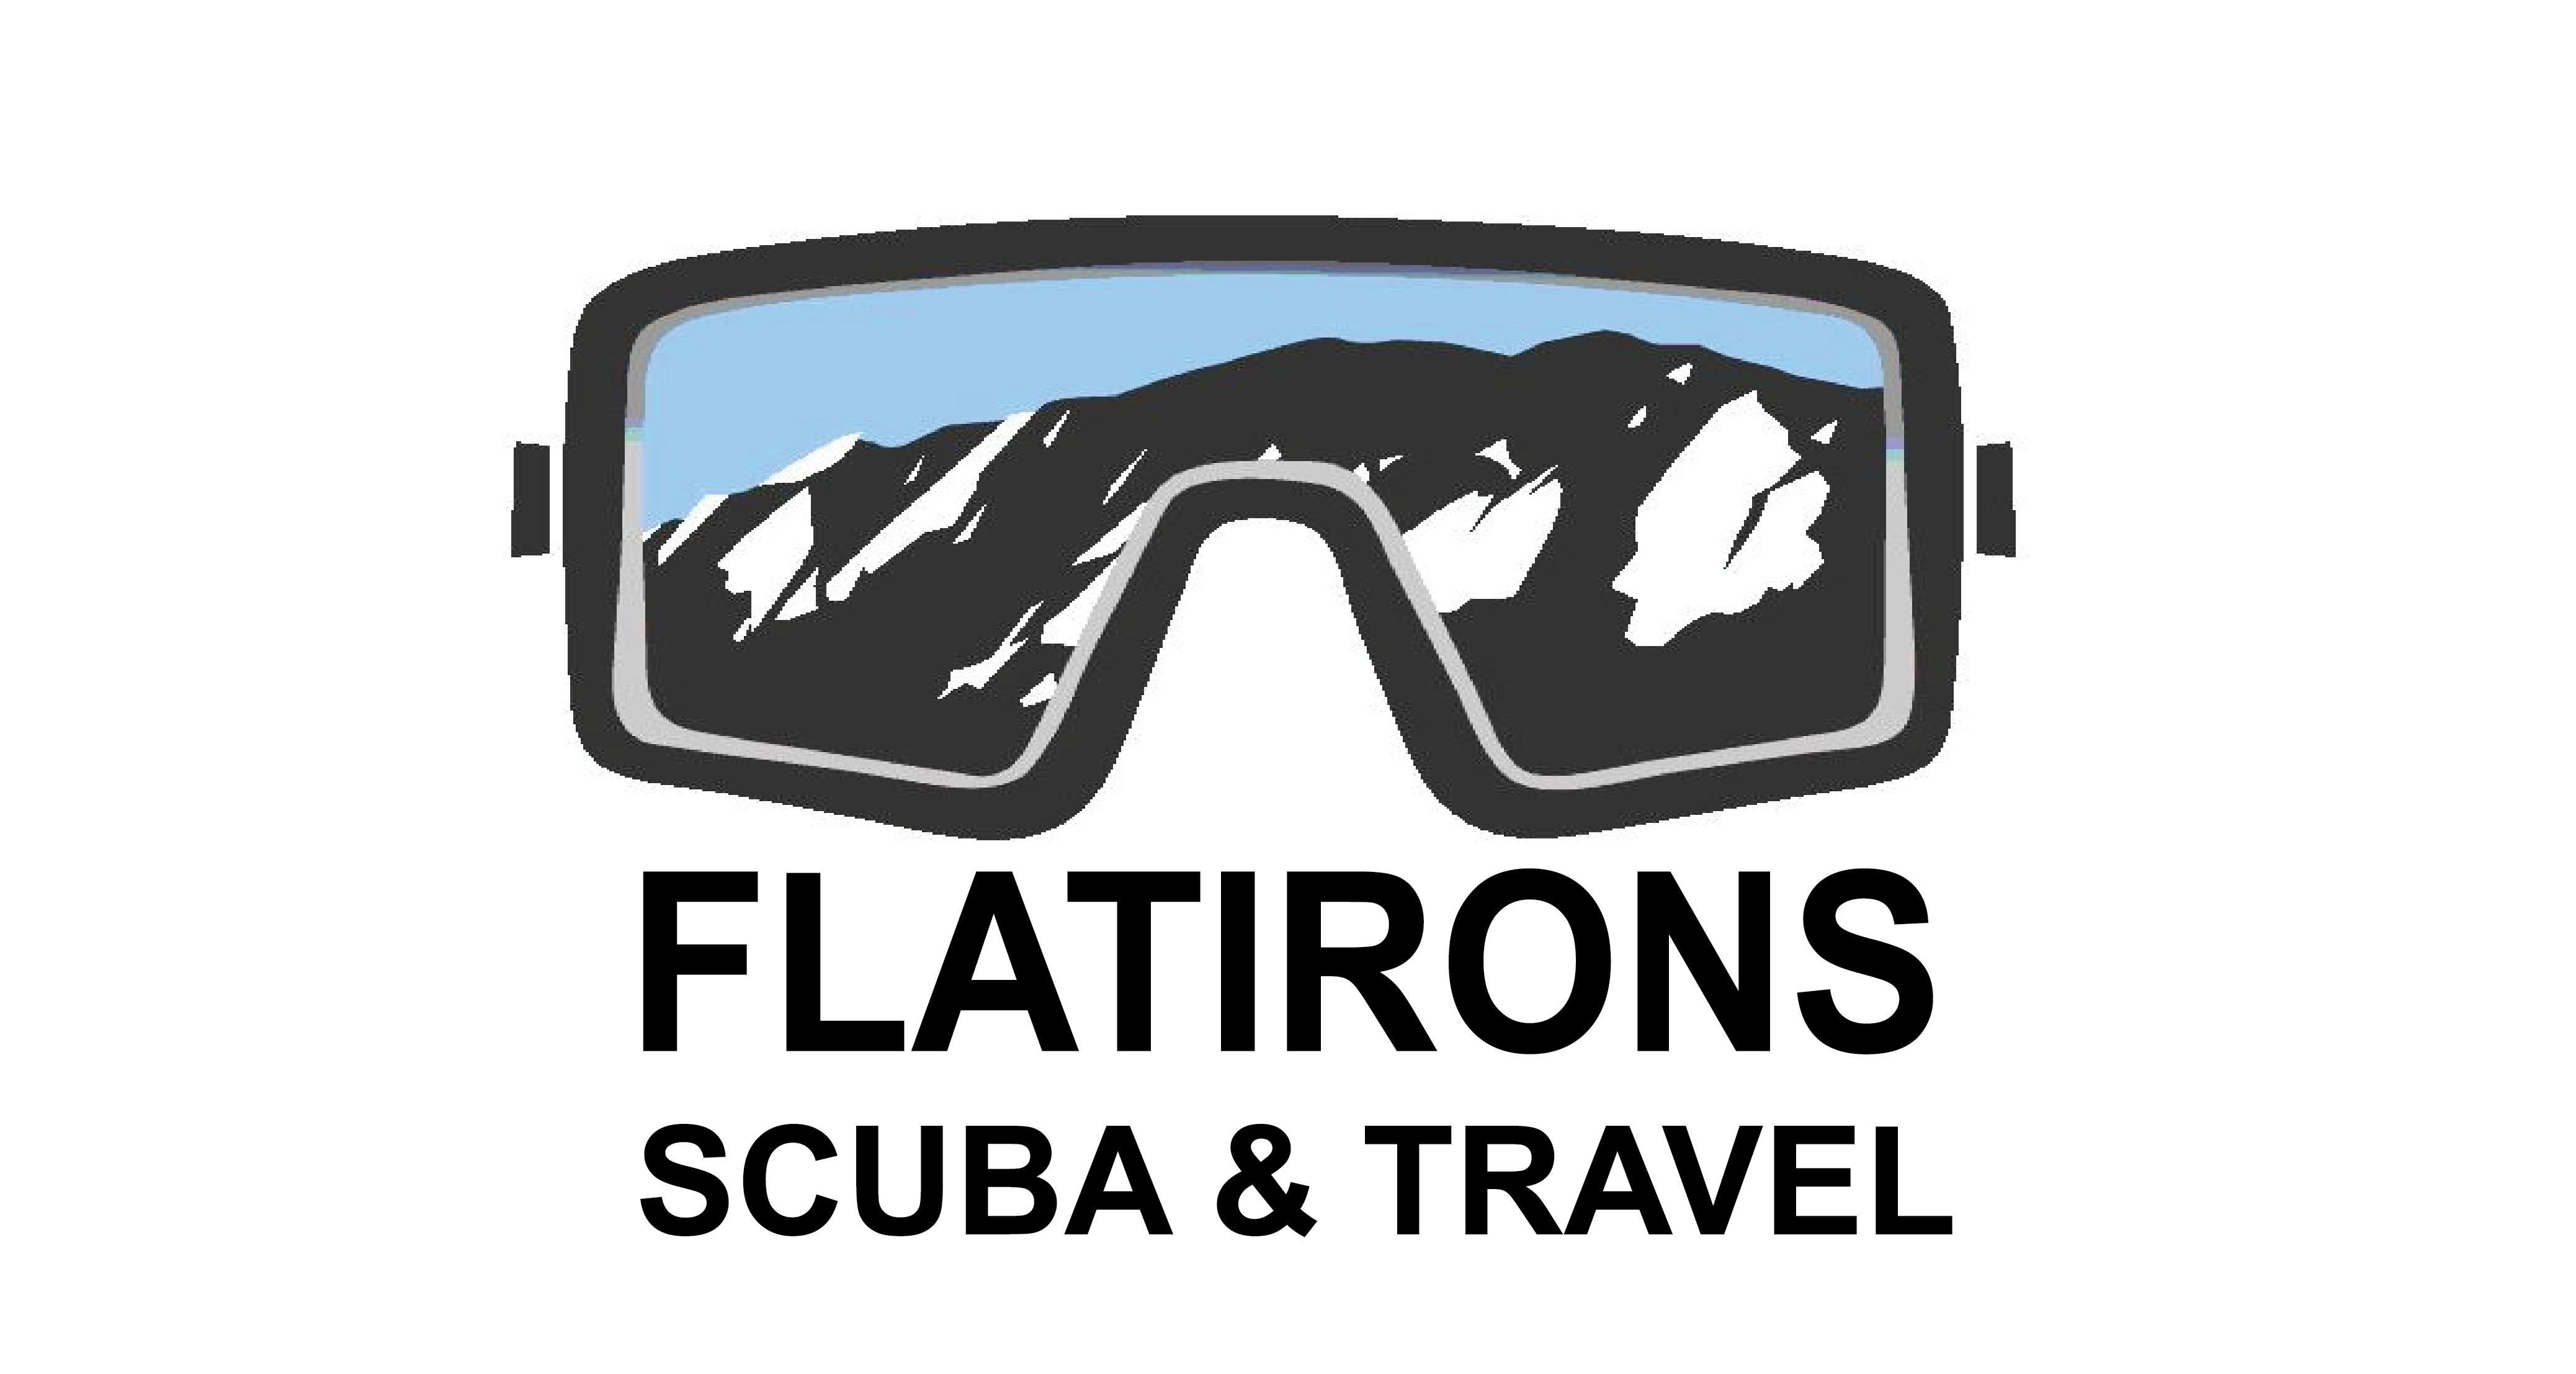 FLATIRONS SCUBA